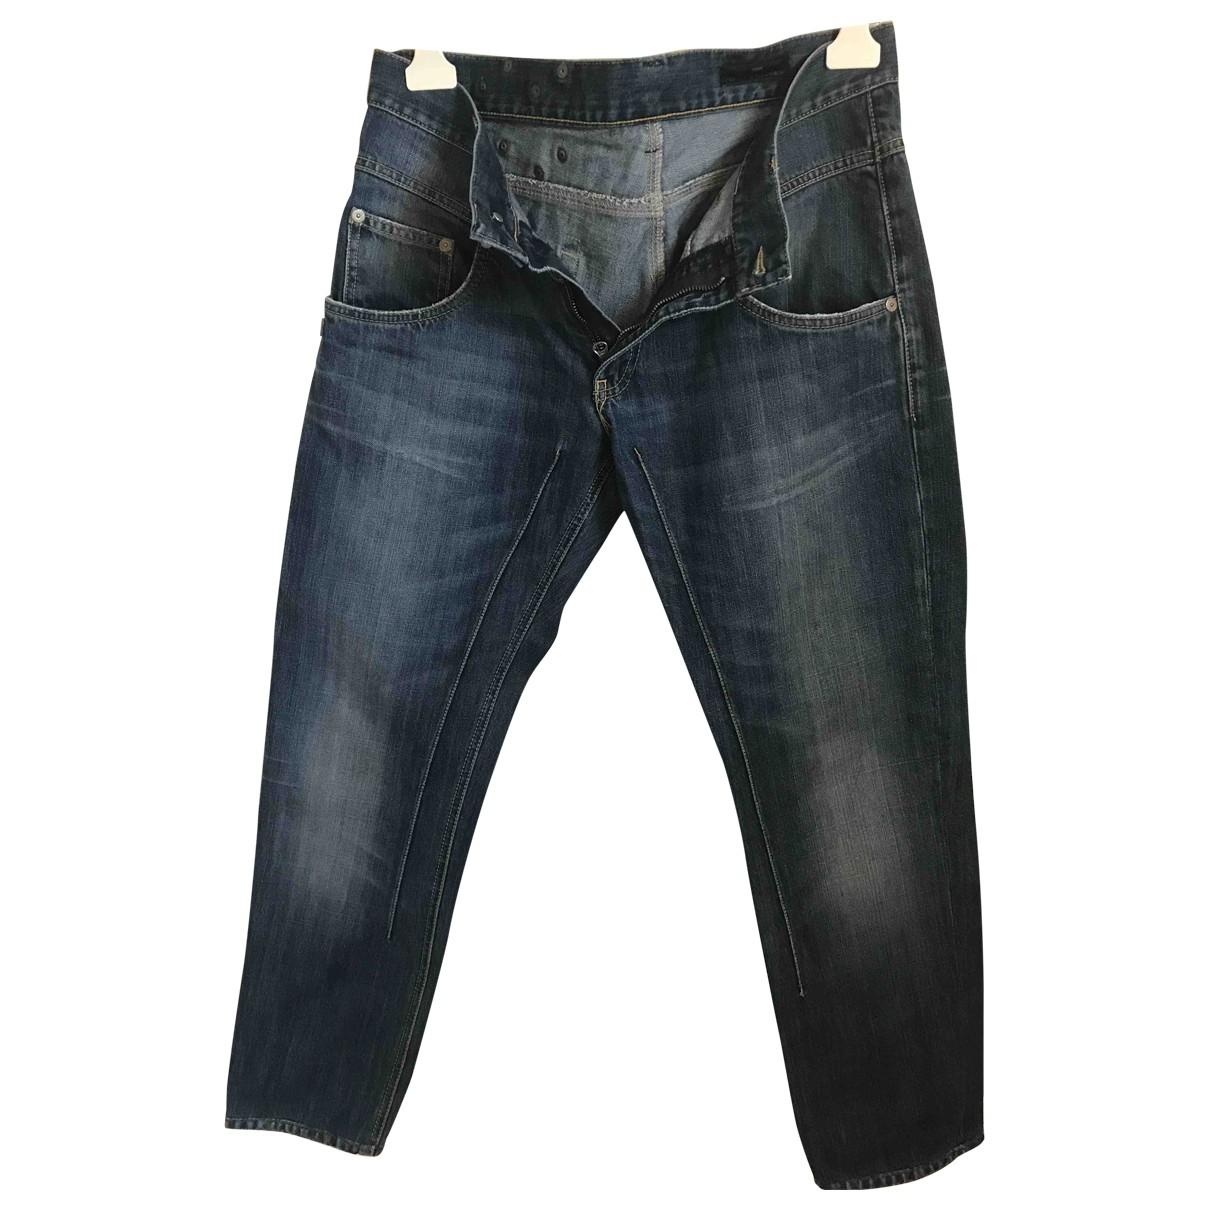 Alessandrini \N Blue Cotton Jeans for Men 34 US